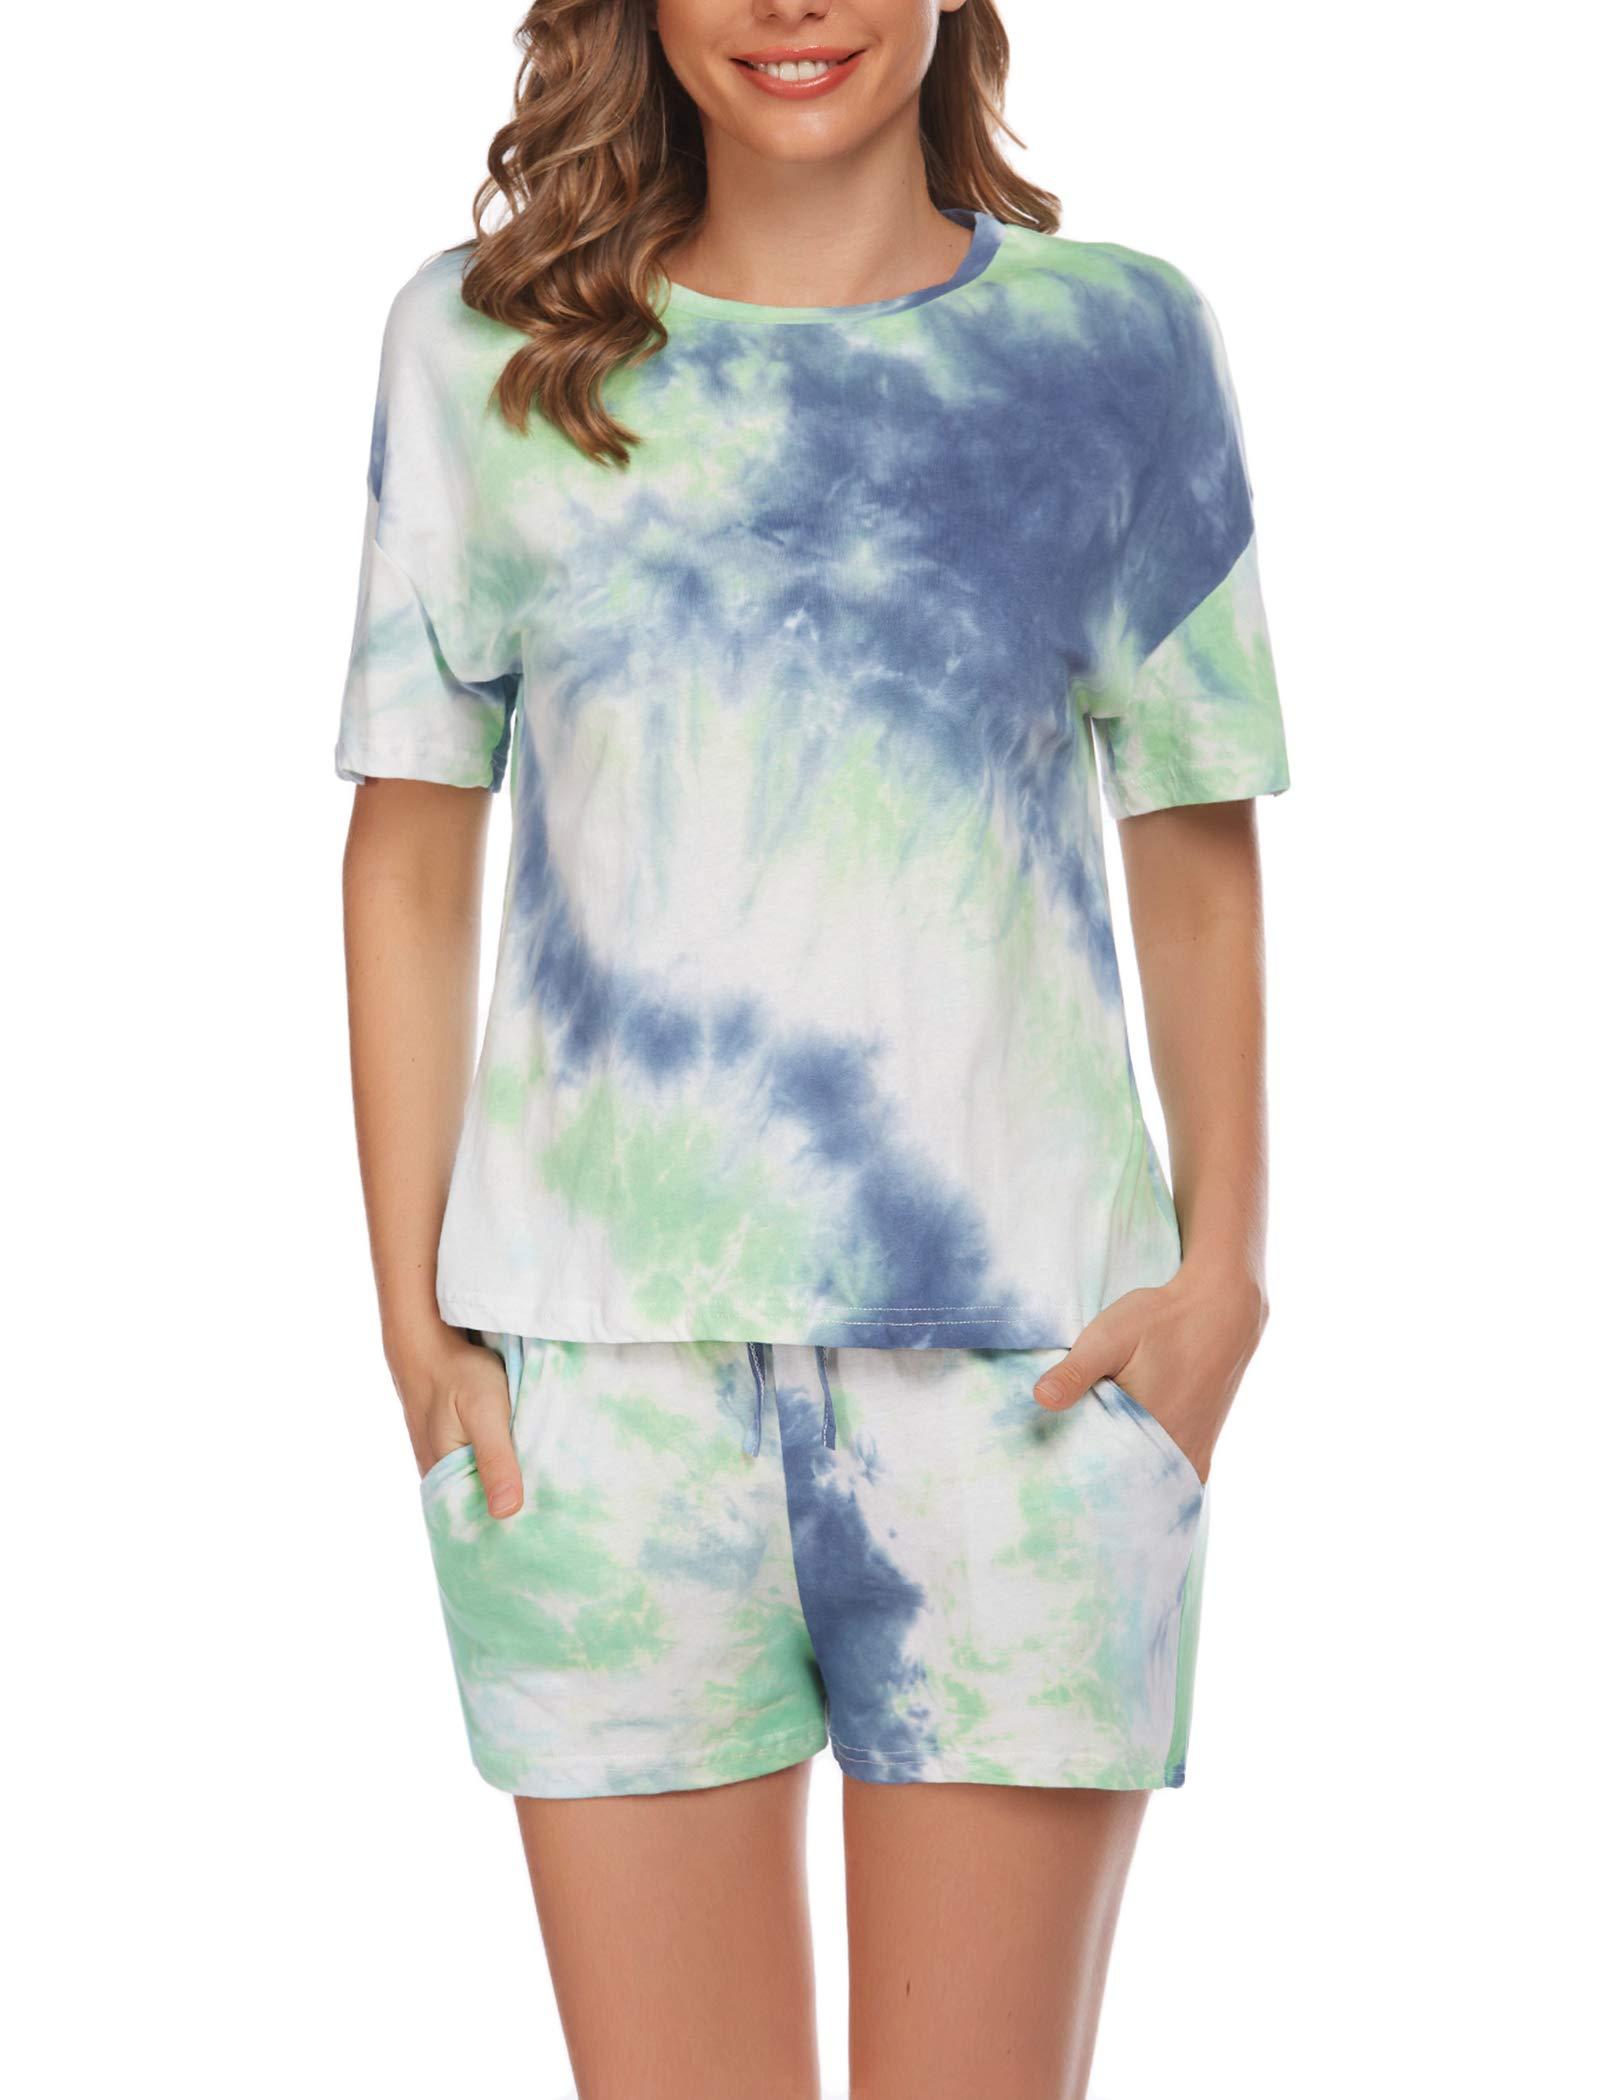 Evanhome Women Pajamas Set Short Sleeve 2 Piece PJ Set V-Neck Tops